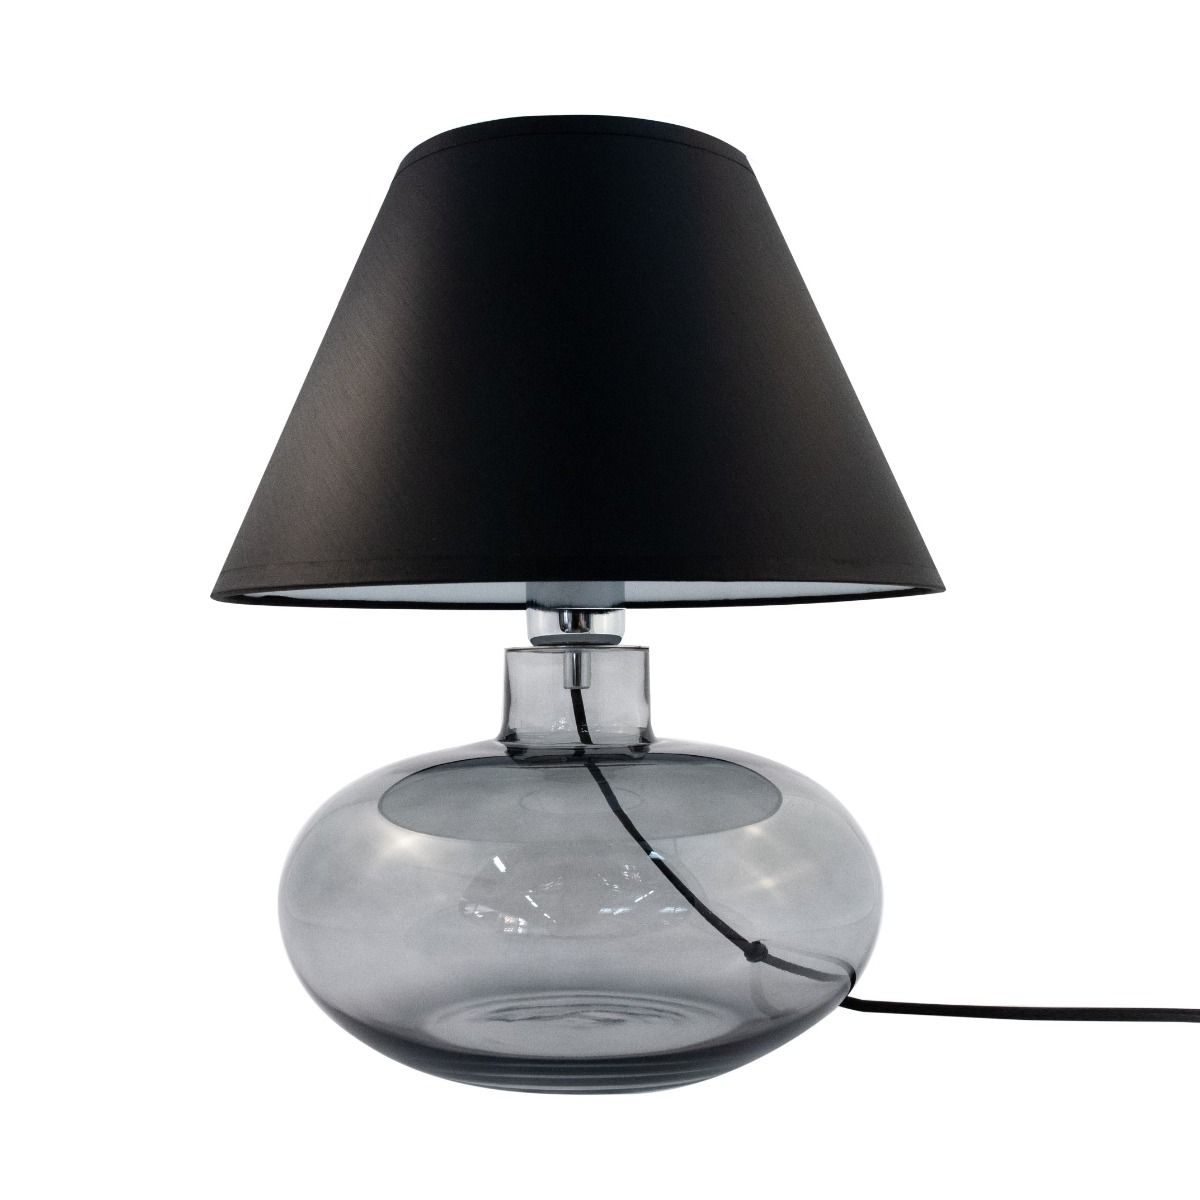 Настолна лампа Mersin, черна